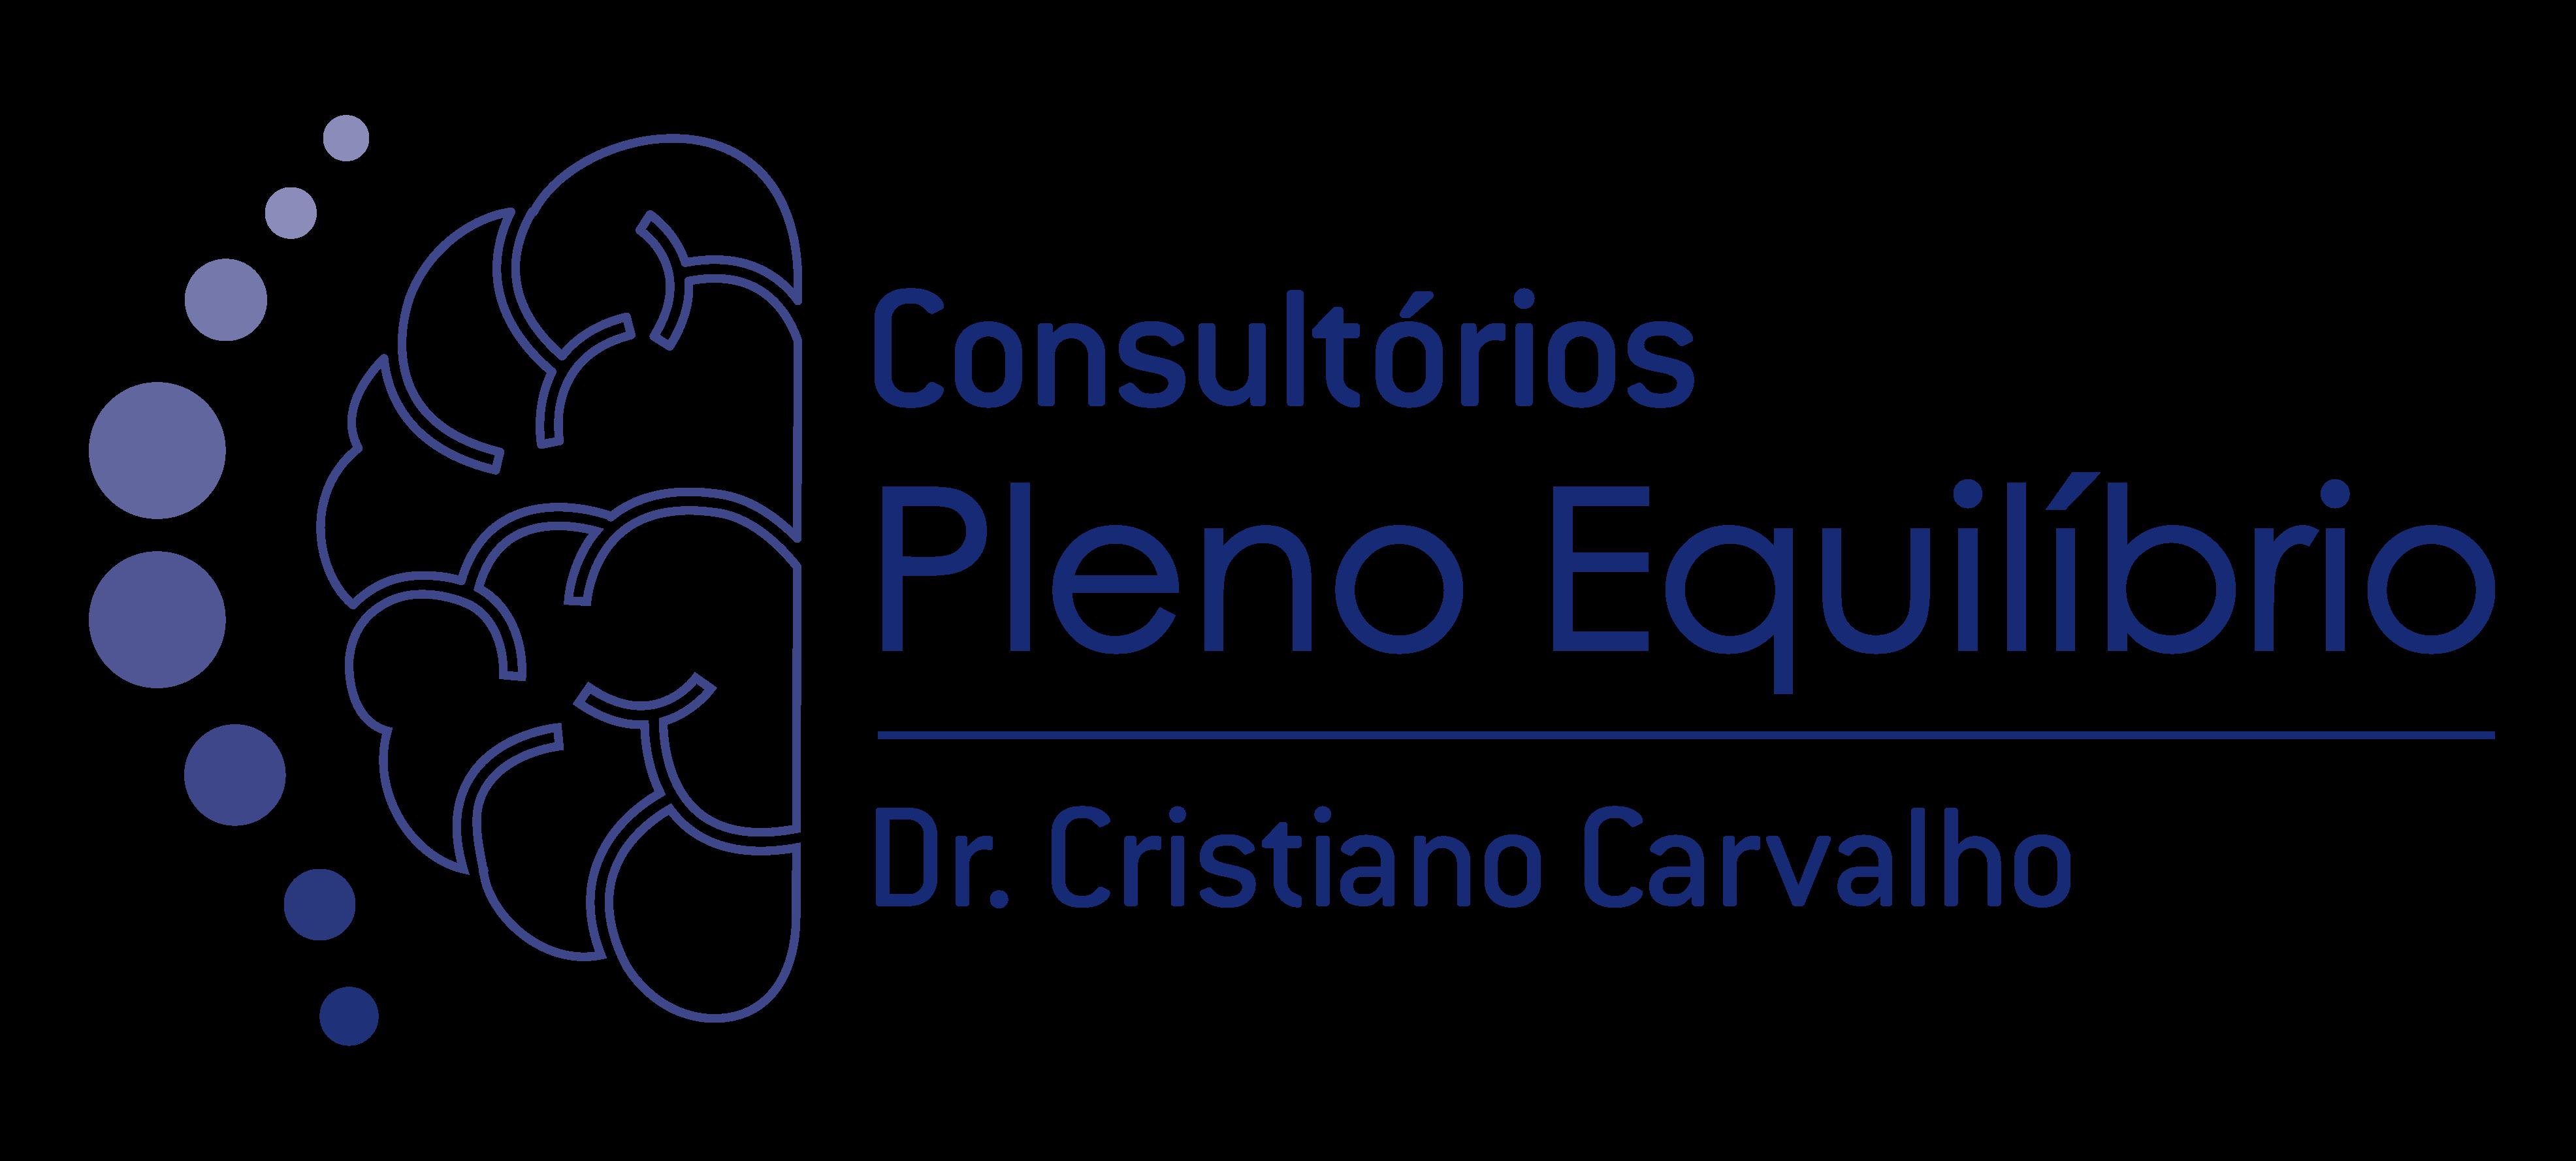 Consultórios Pleno Equilíbrio | Osteopatia, Hipnoterapia/Psicologia